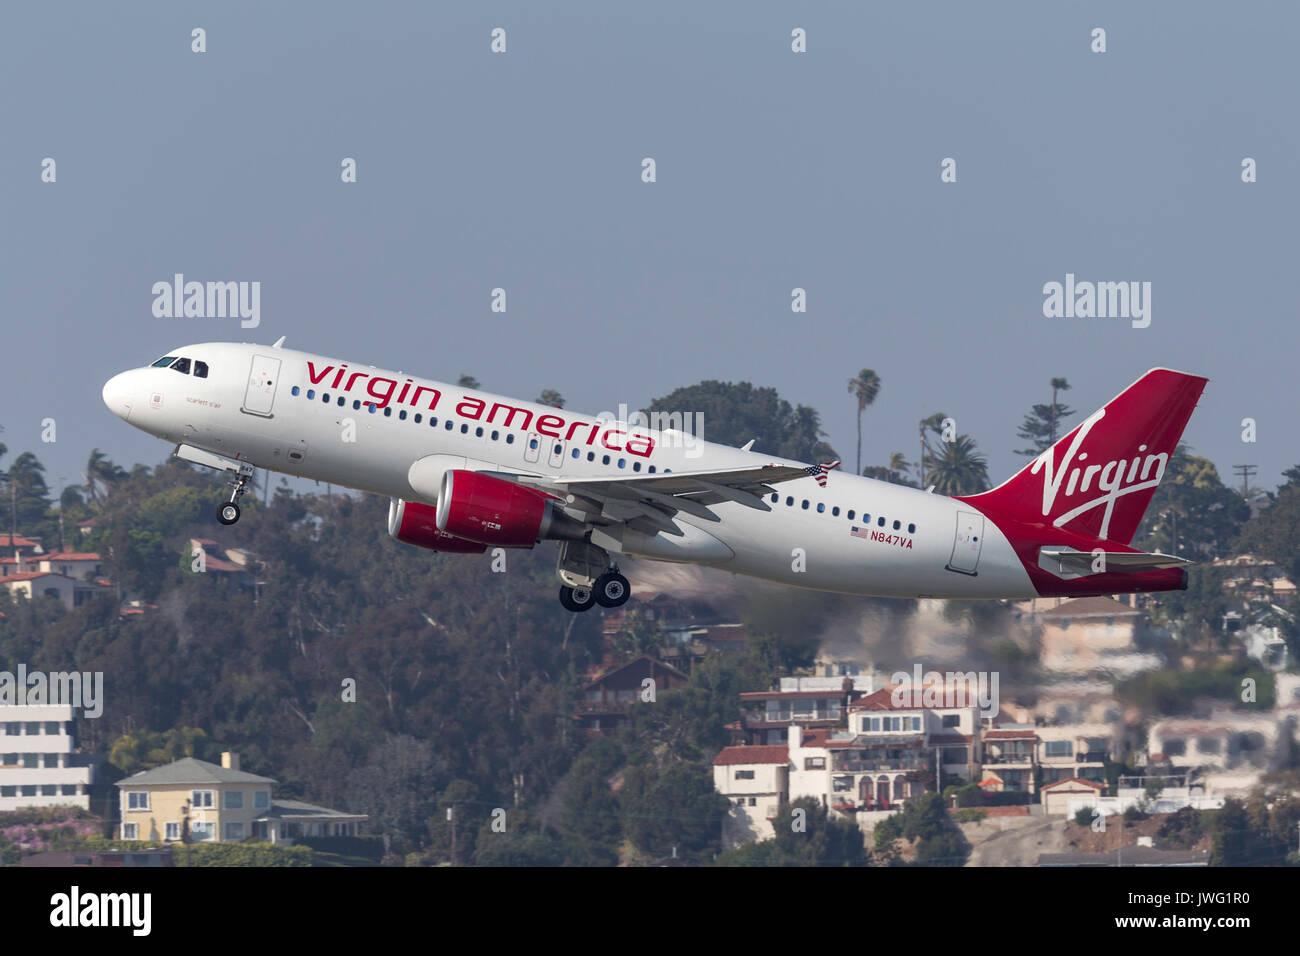 Virgin America Airbus A320-214 N847VA departing San Diego International Airport. - Stock Image